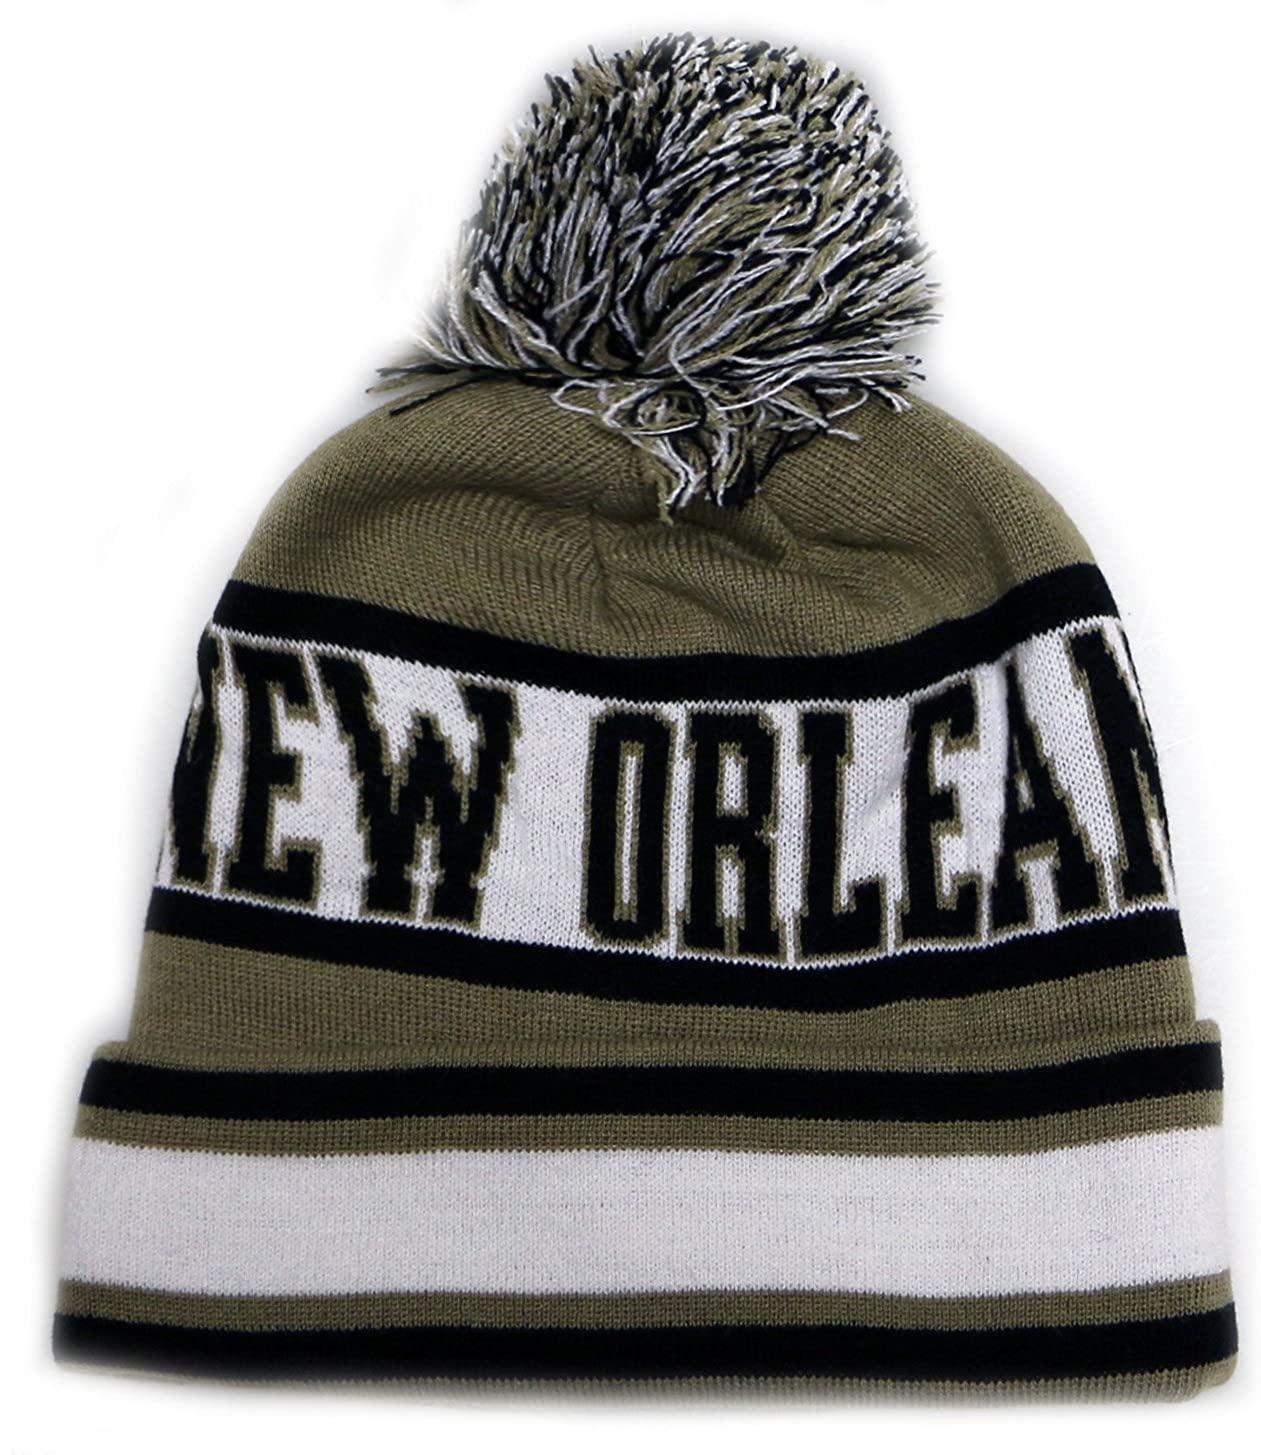 City Hunter Sk1130 New Orleans Stripes Pom Pom Beanie Hats - Khaki/black